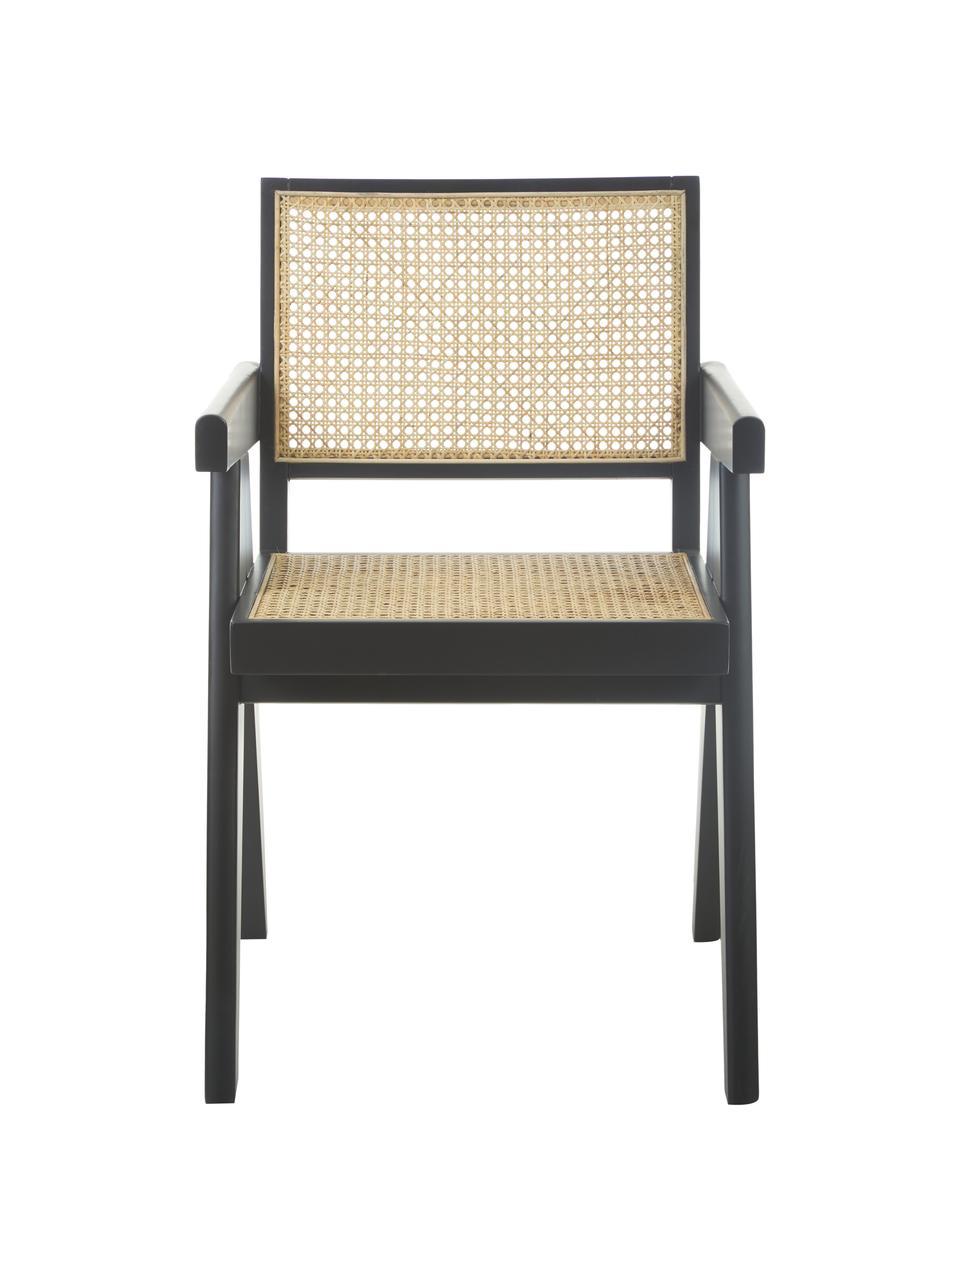 Armlehnstuhl Sissi mit Wiener Geflecht, Gestell: Massives Buchenholz, lack, Sitzfläche: Rattan, Buchenholz, B 52 x T 58 cm